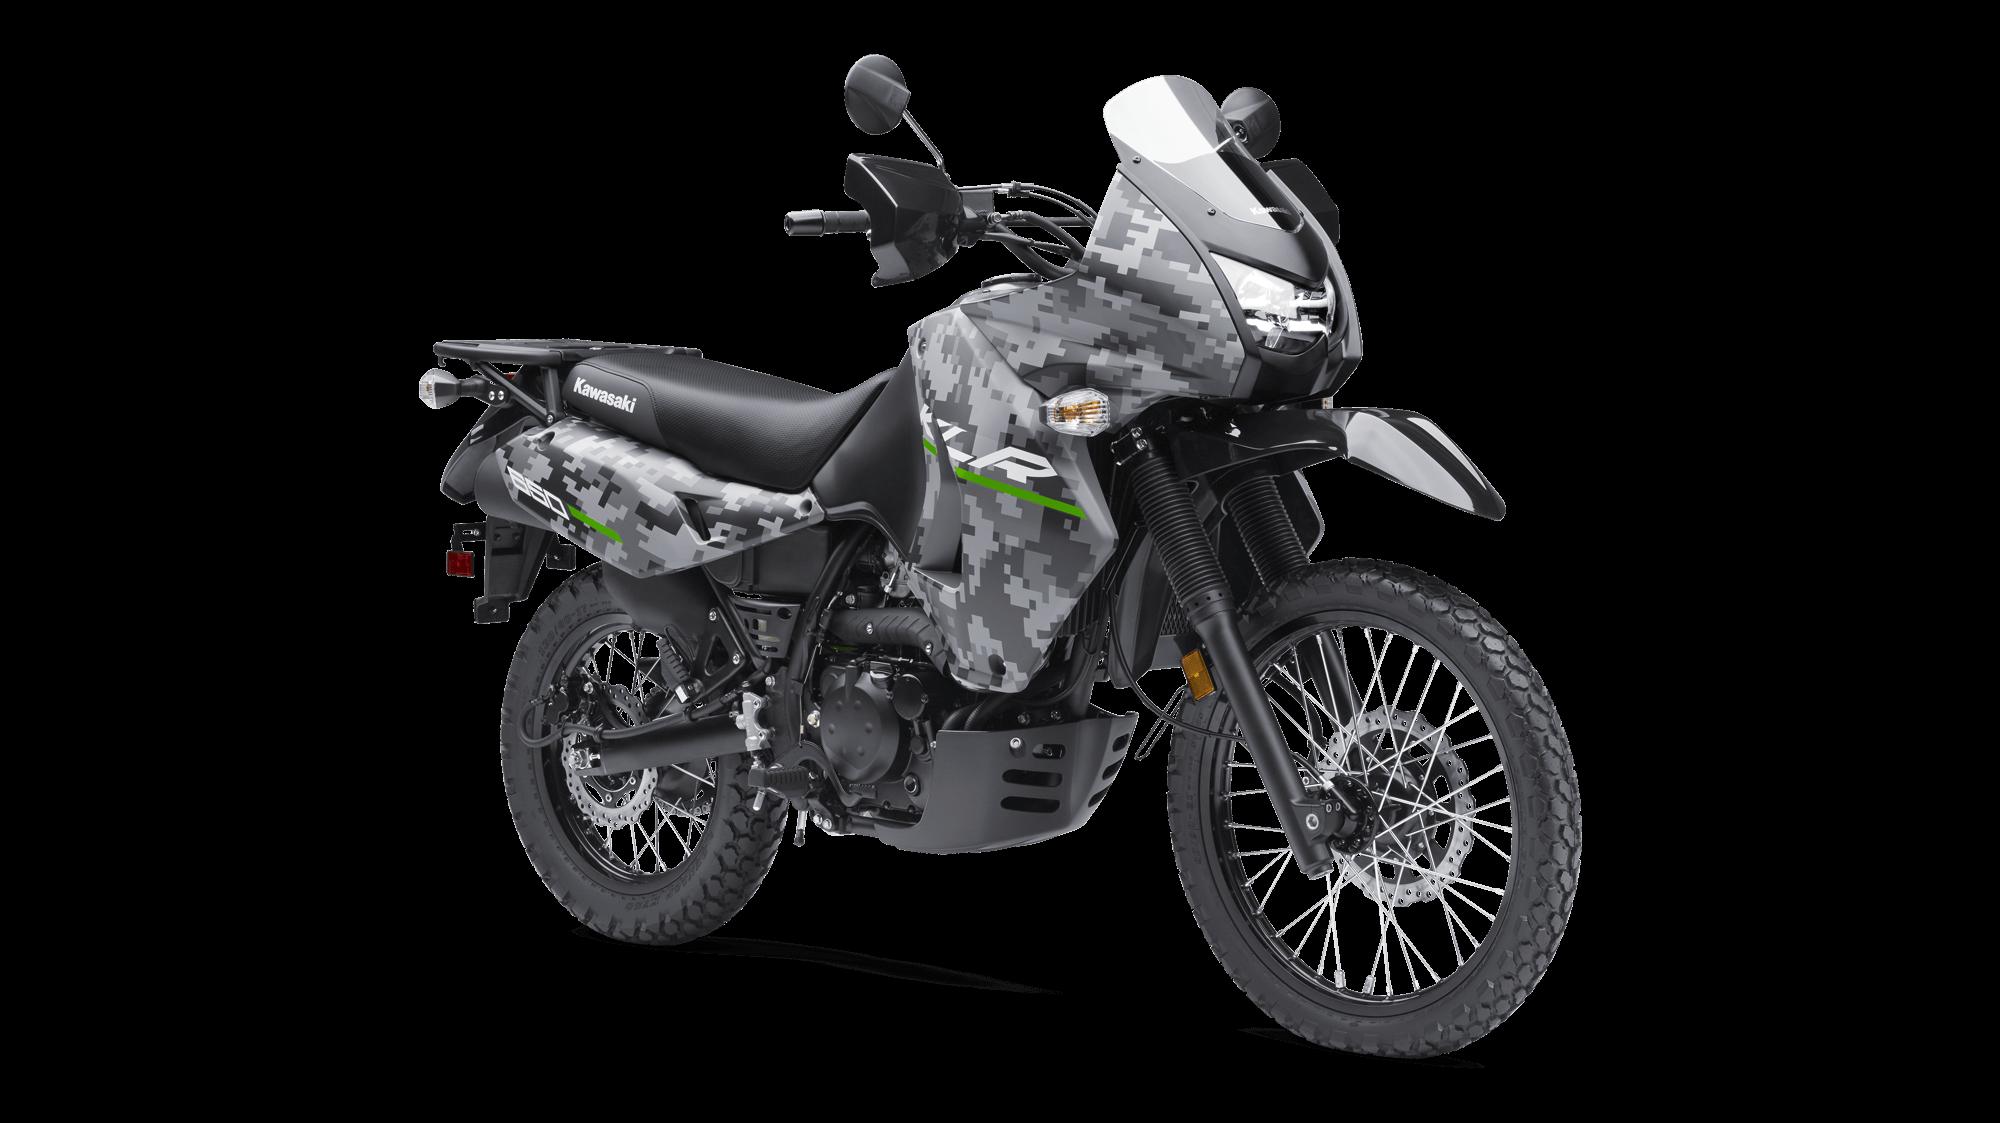 Awe Inspiring 9 Entry Level Adventure Motorcycles You Should Consider Inzonedesignstudio Interior Chair Design Inzonedesignstudiocom